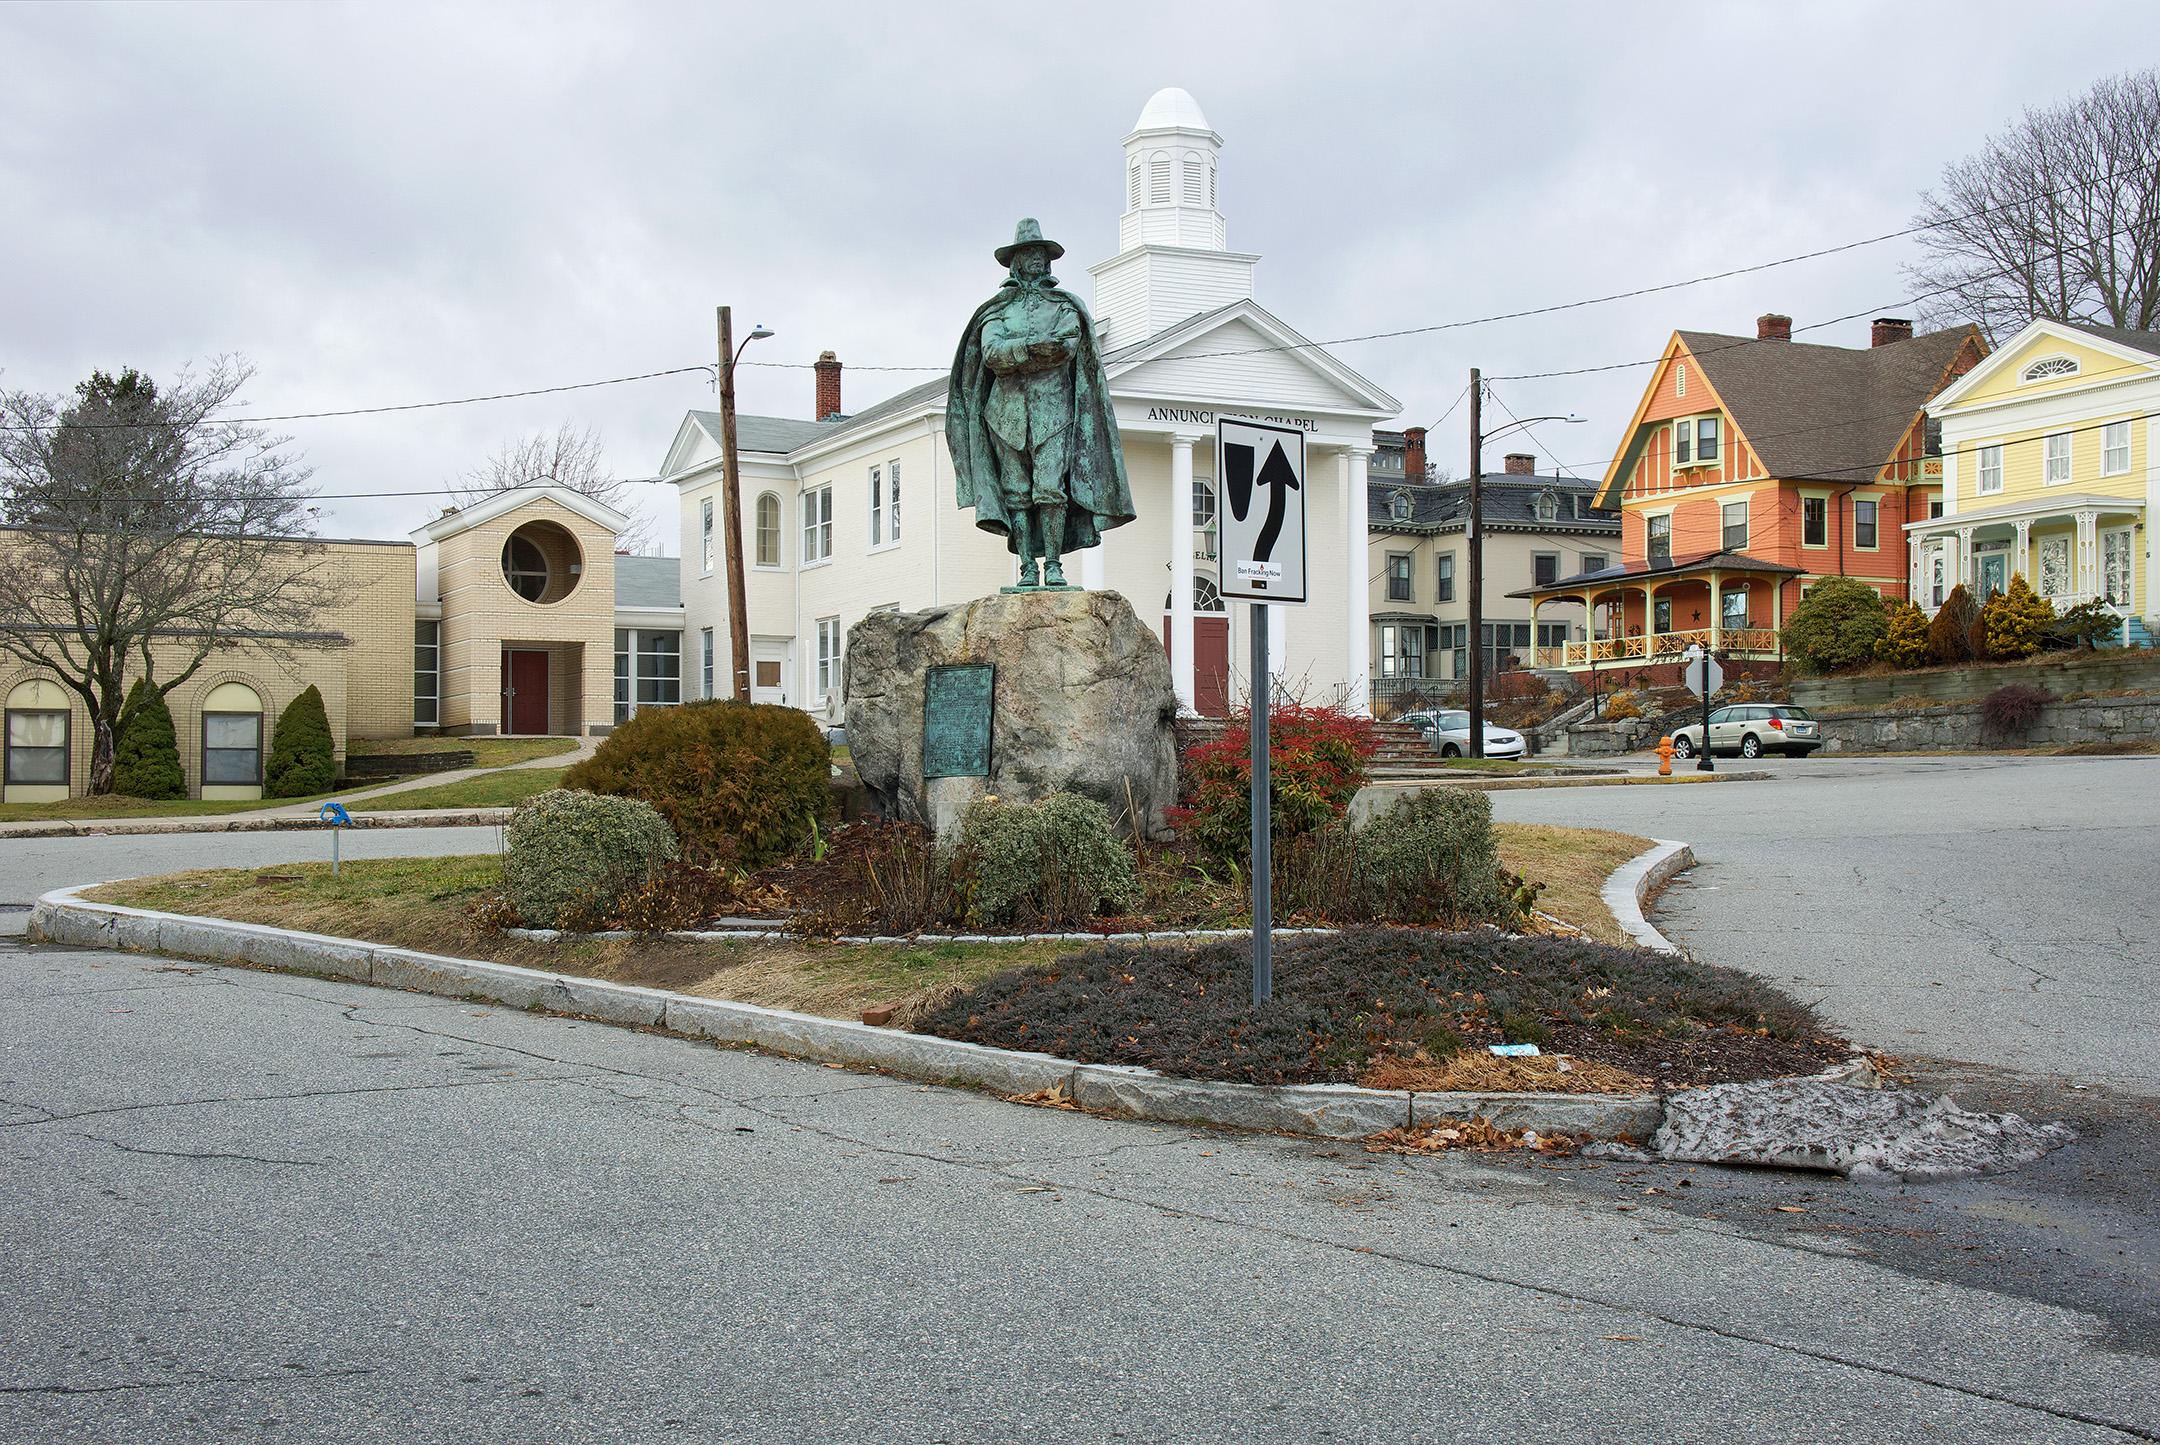 Ted Hendrickson, Winthrop Statue, New London, CT